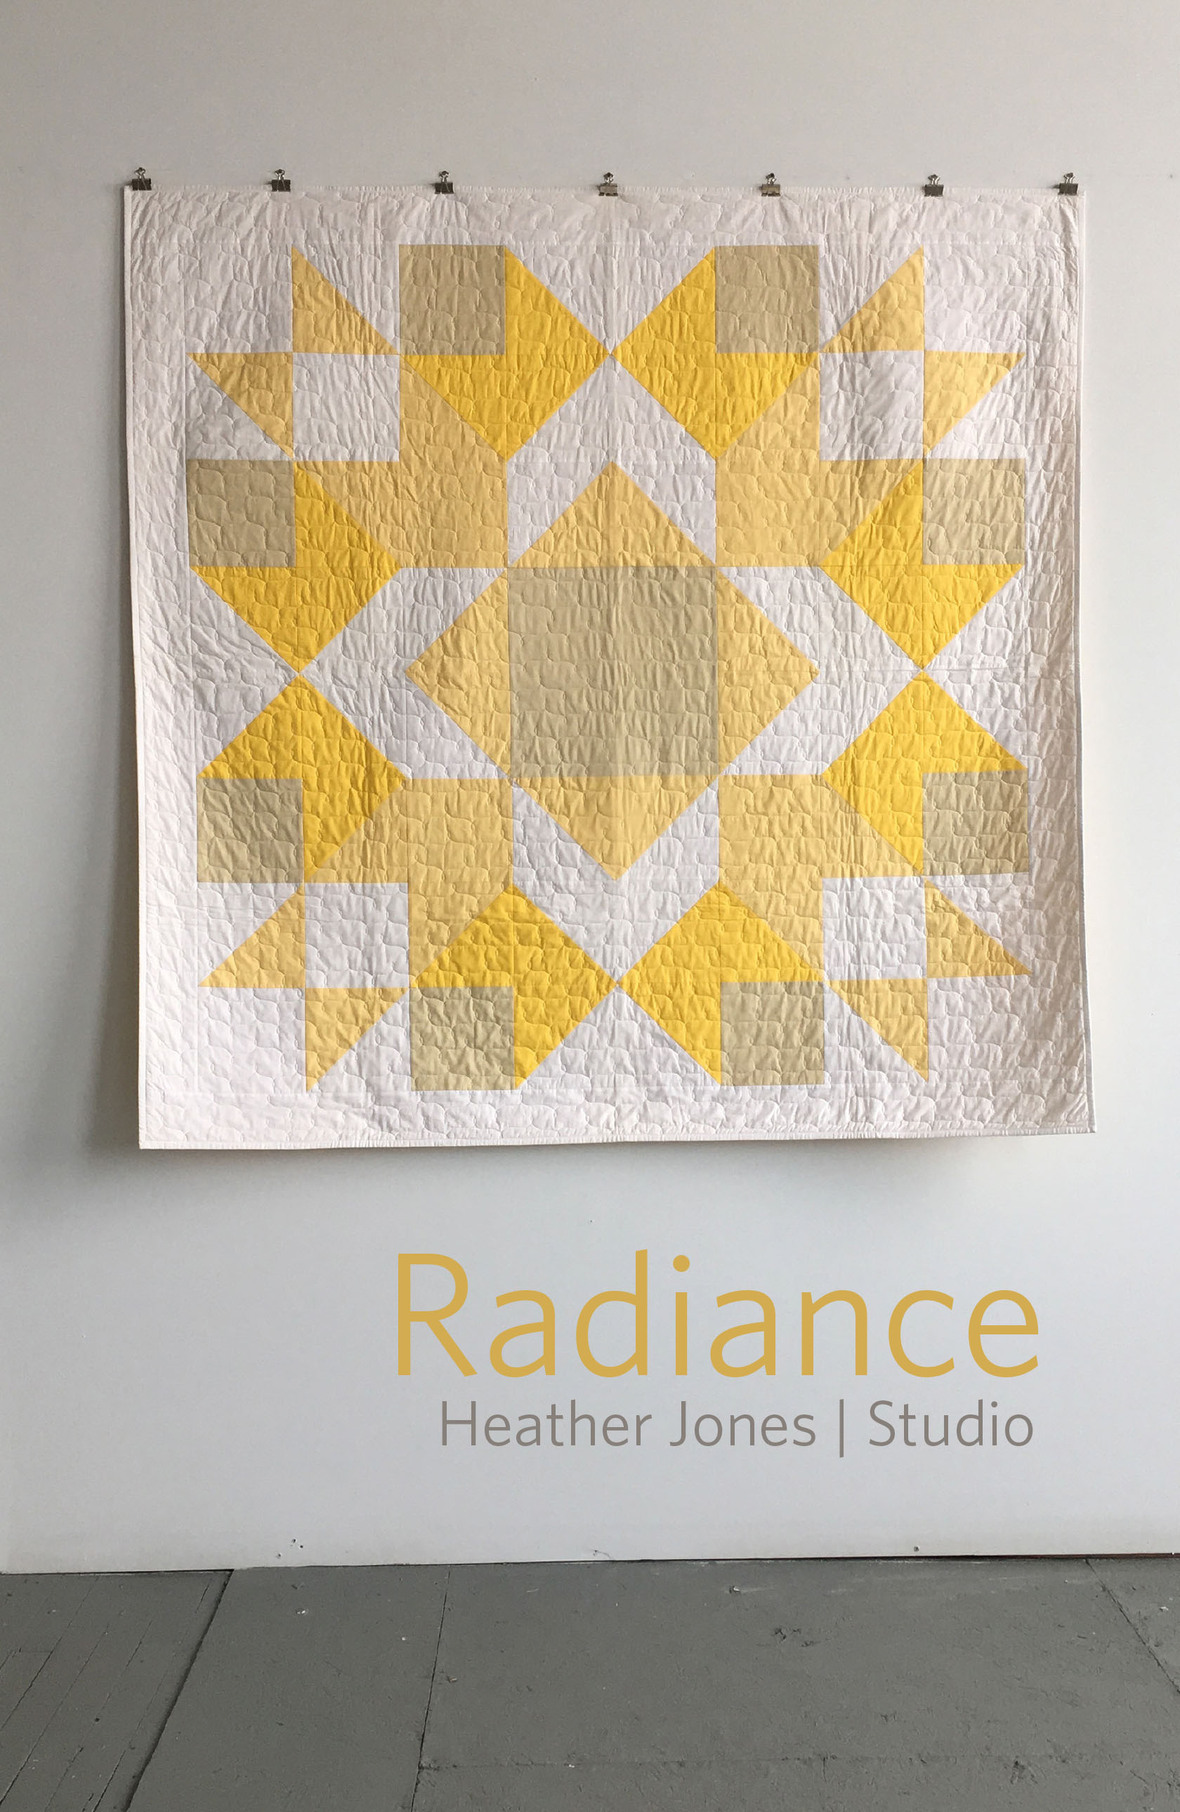 heather jones radiance sewing pattern